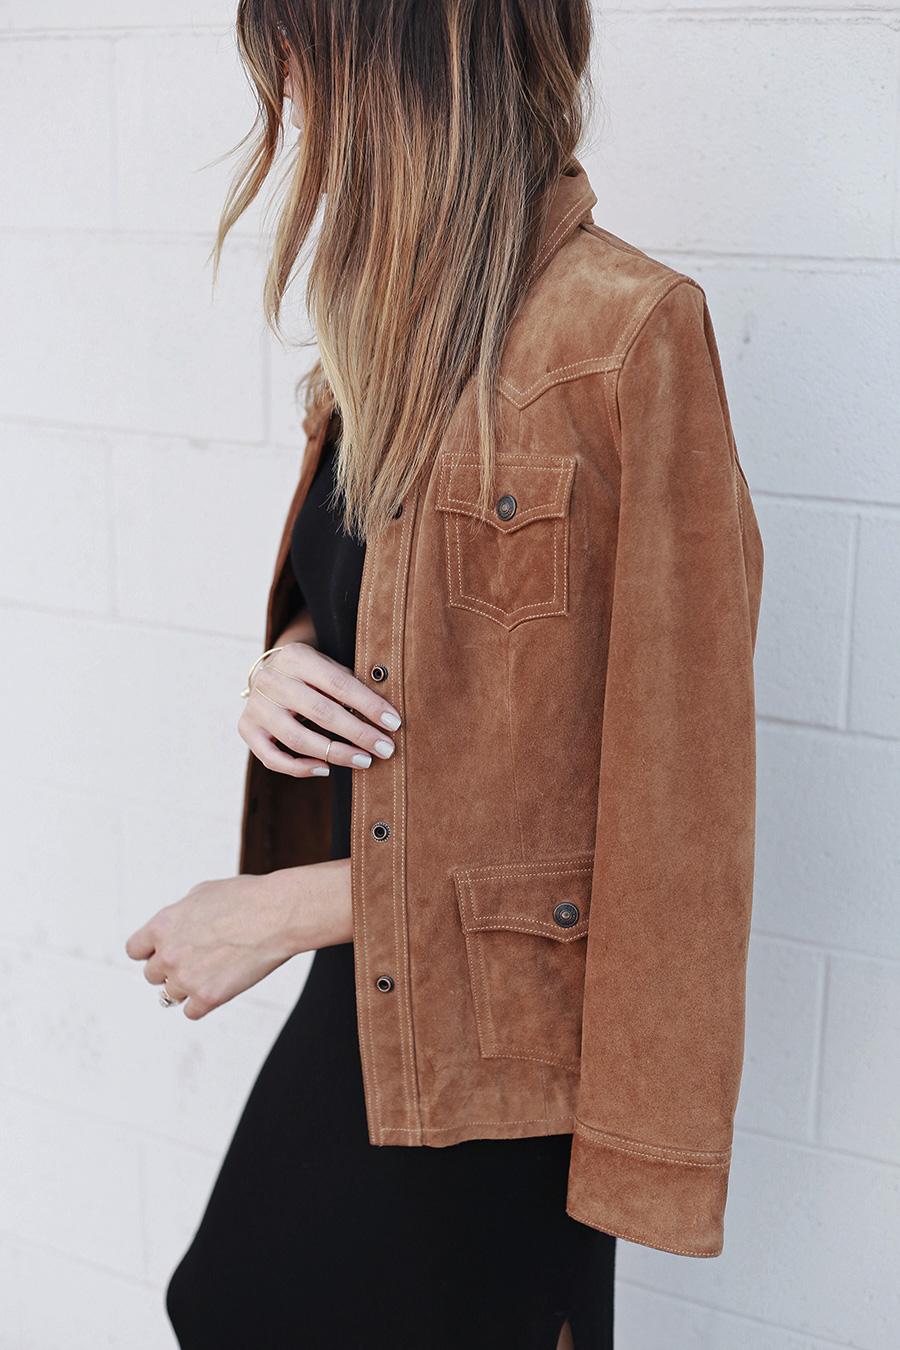 Midi Ring Grey Nails Gap Leather Jacket